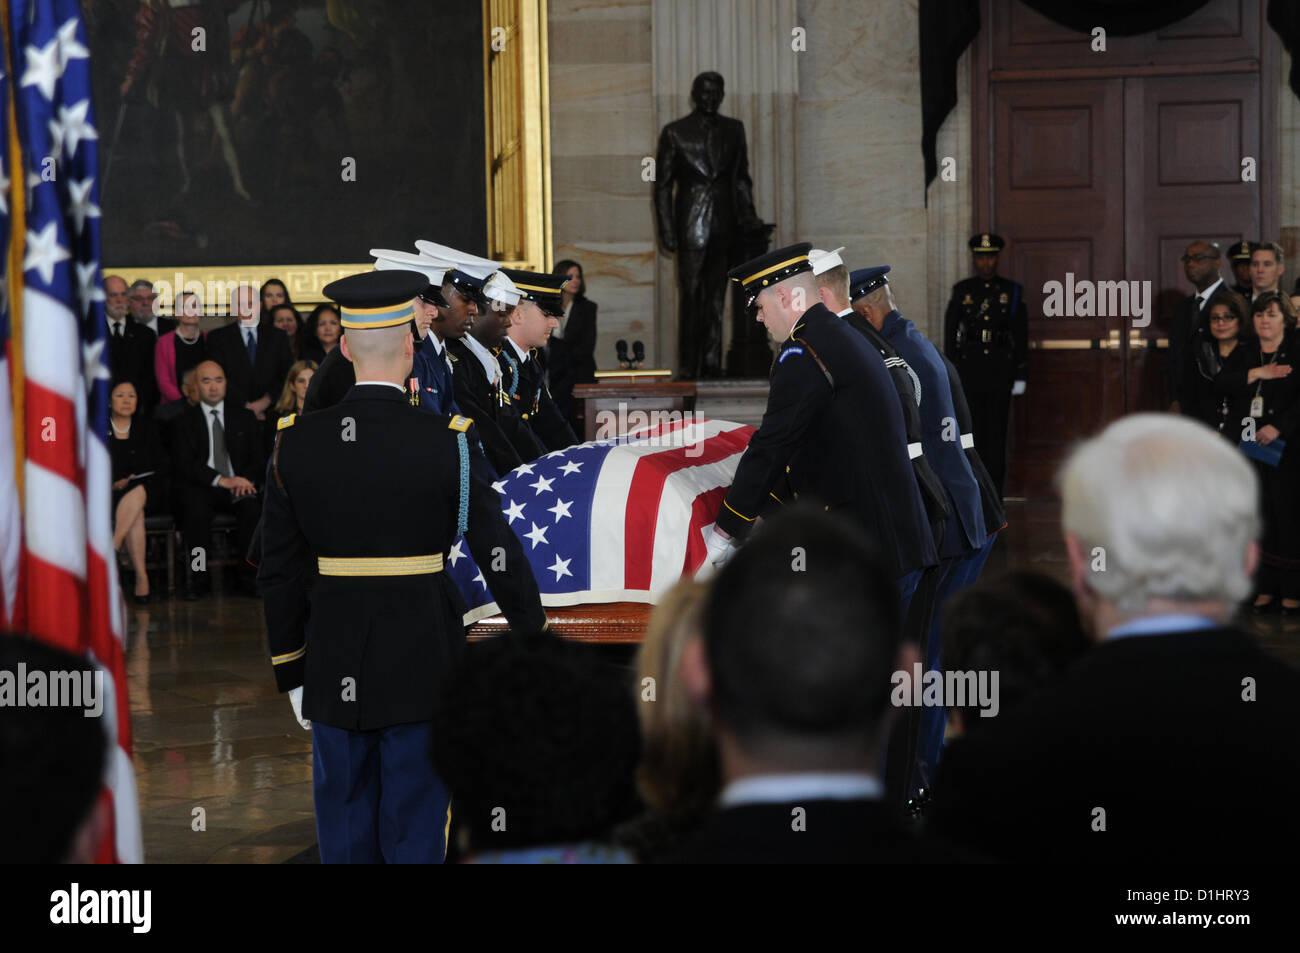 Military honor guards prepare to remove the casket of Senator Daniel Inouye lying in state in the Rotunda of the - Stock Image